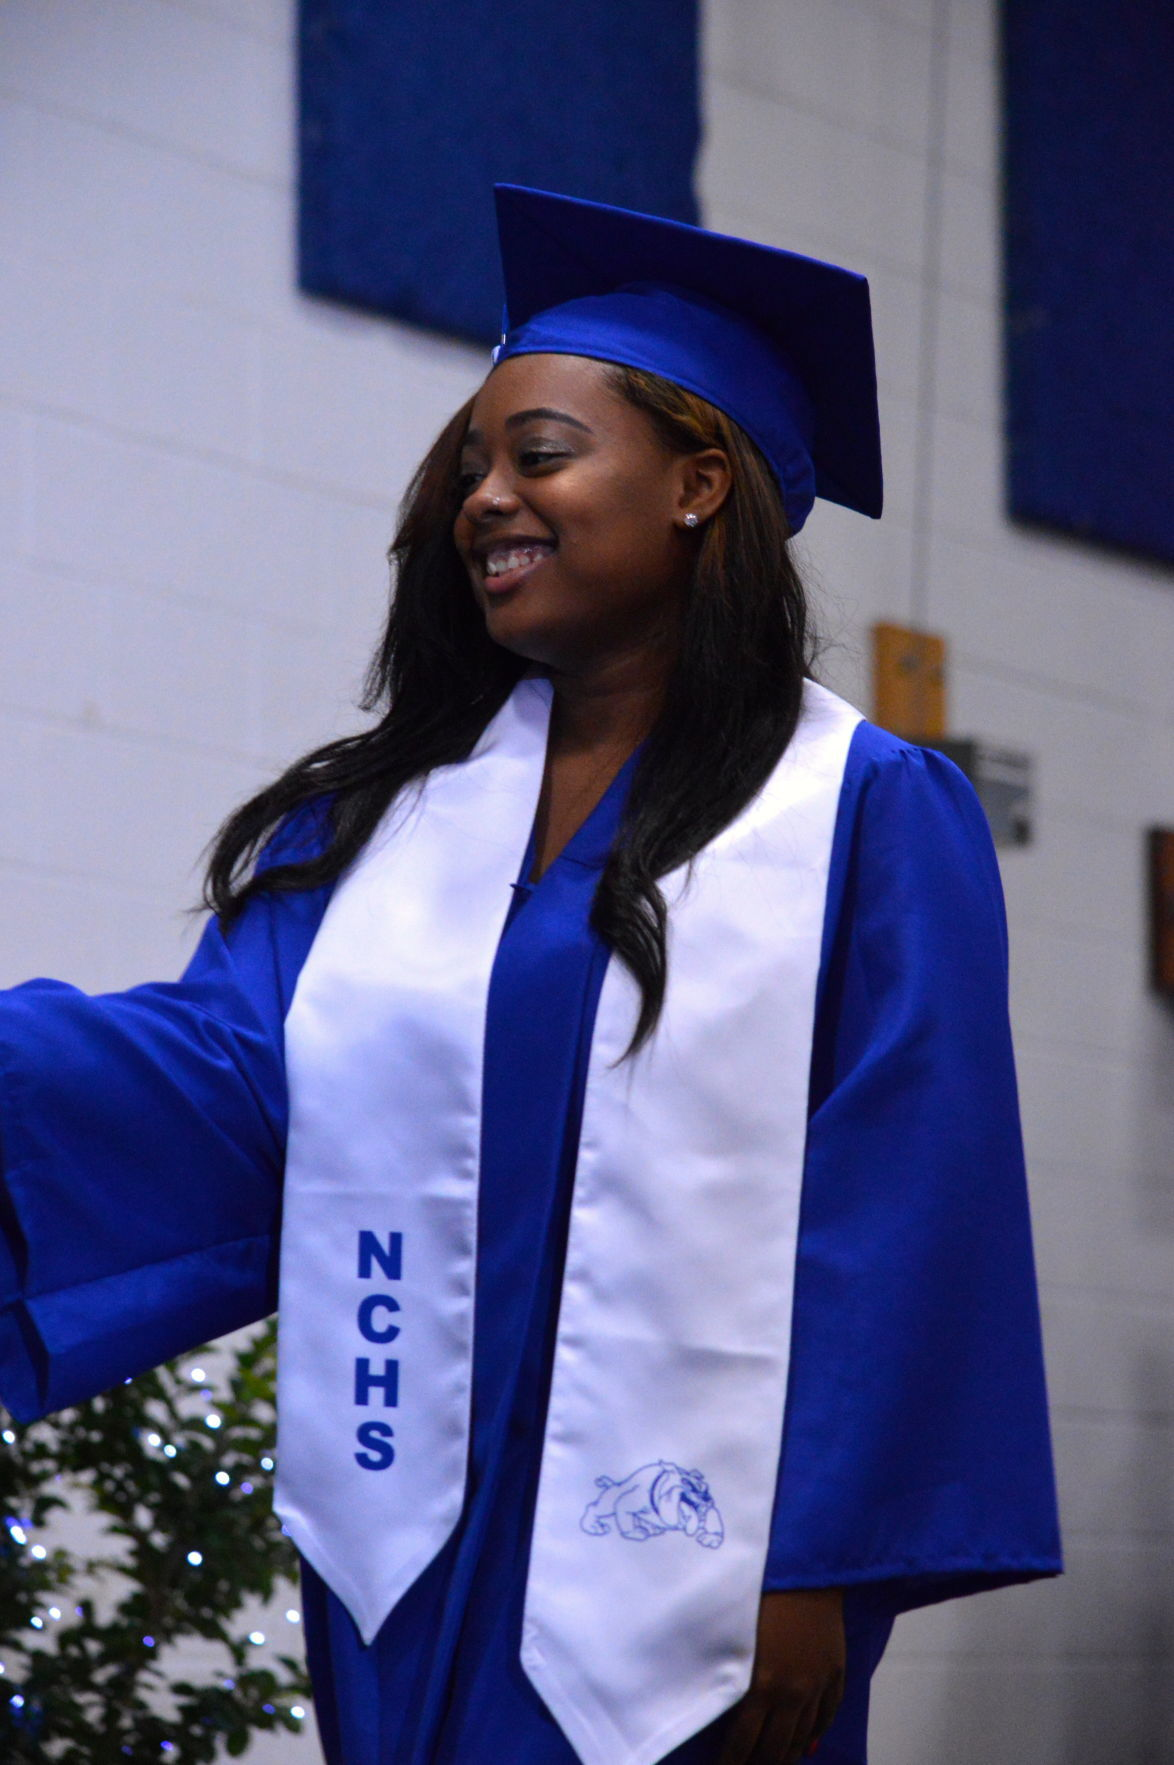 North Caroline Class of 2018